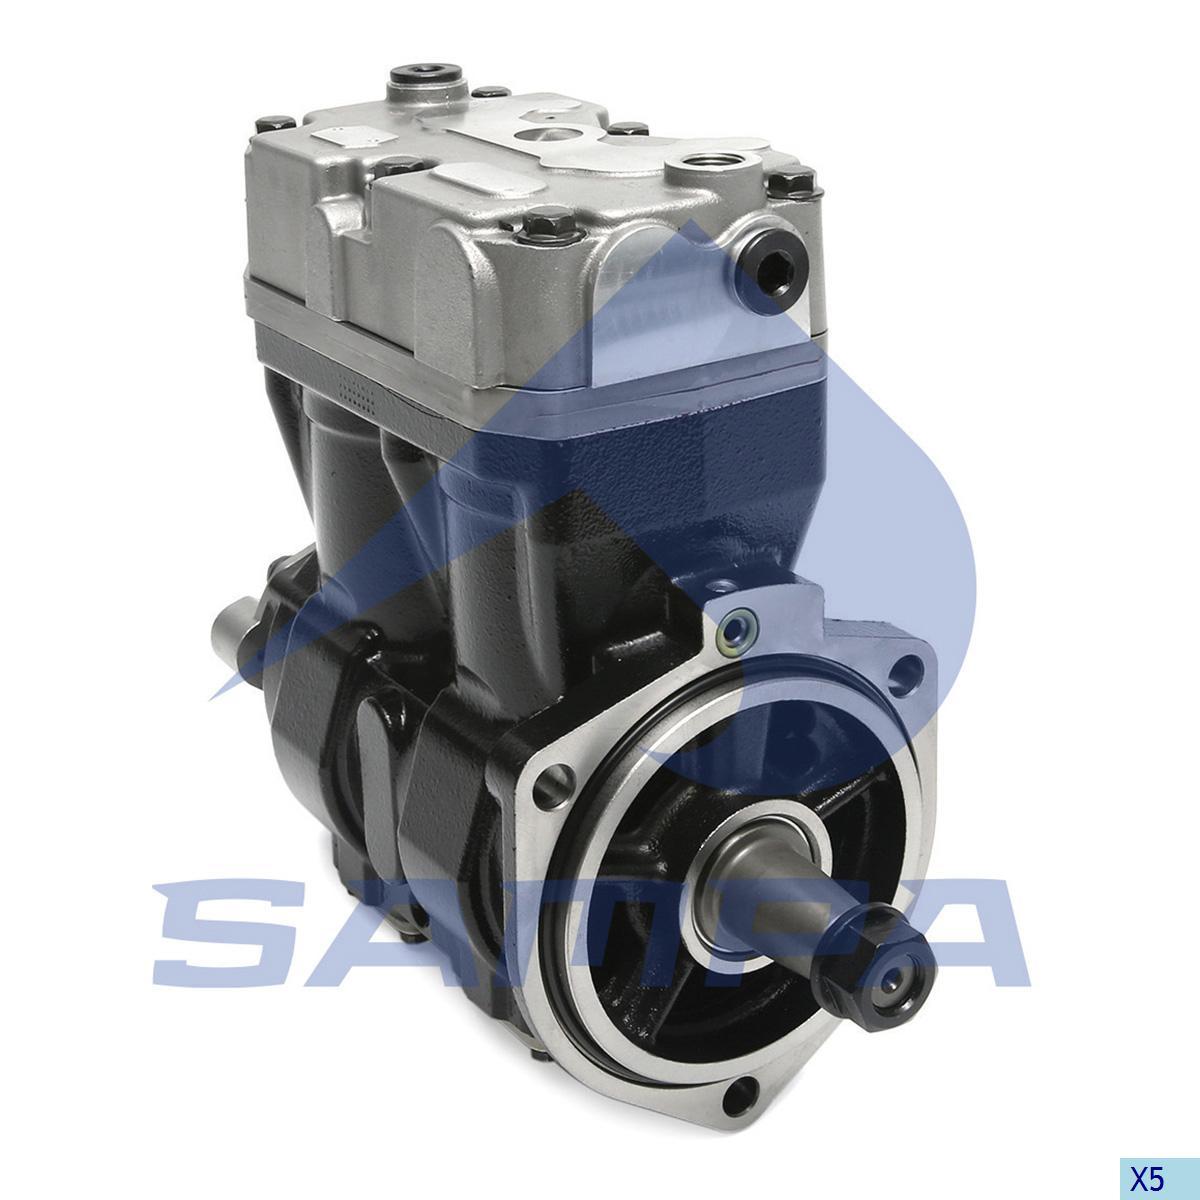 Compressor, Iveco, Compressed Air System